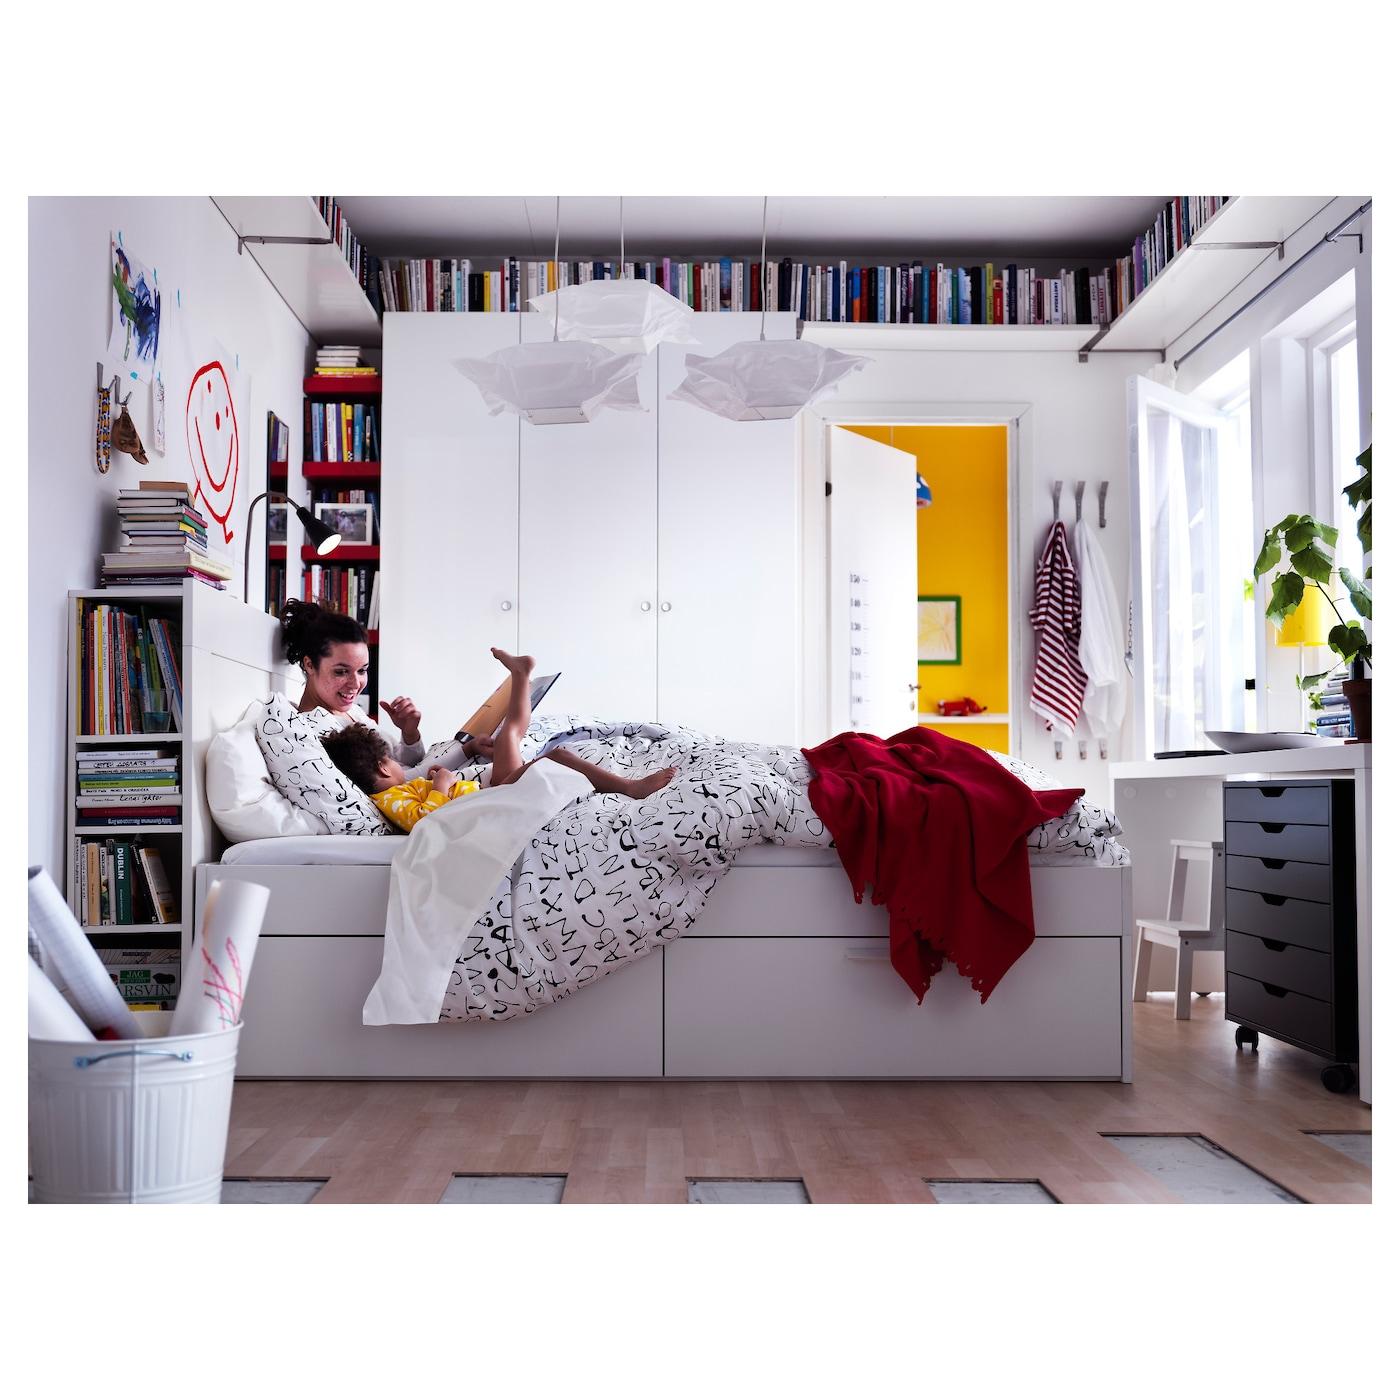 brimnes cadre de lit rangement t te de lit blanc l nset 180x200 cm ikea. Black Bedroom Furniture Sets. Home Design Ideas